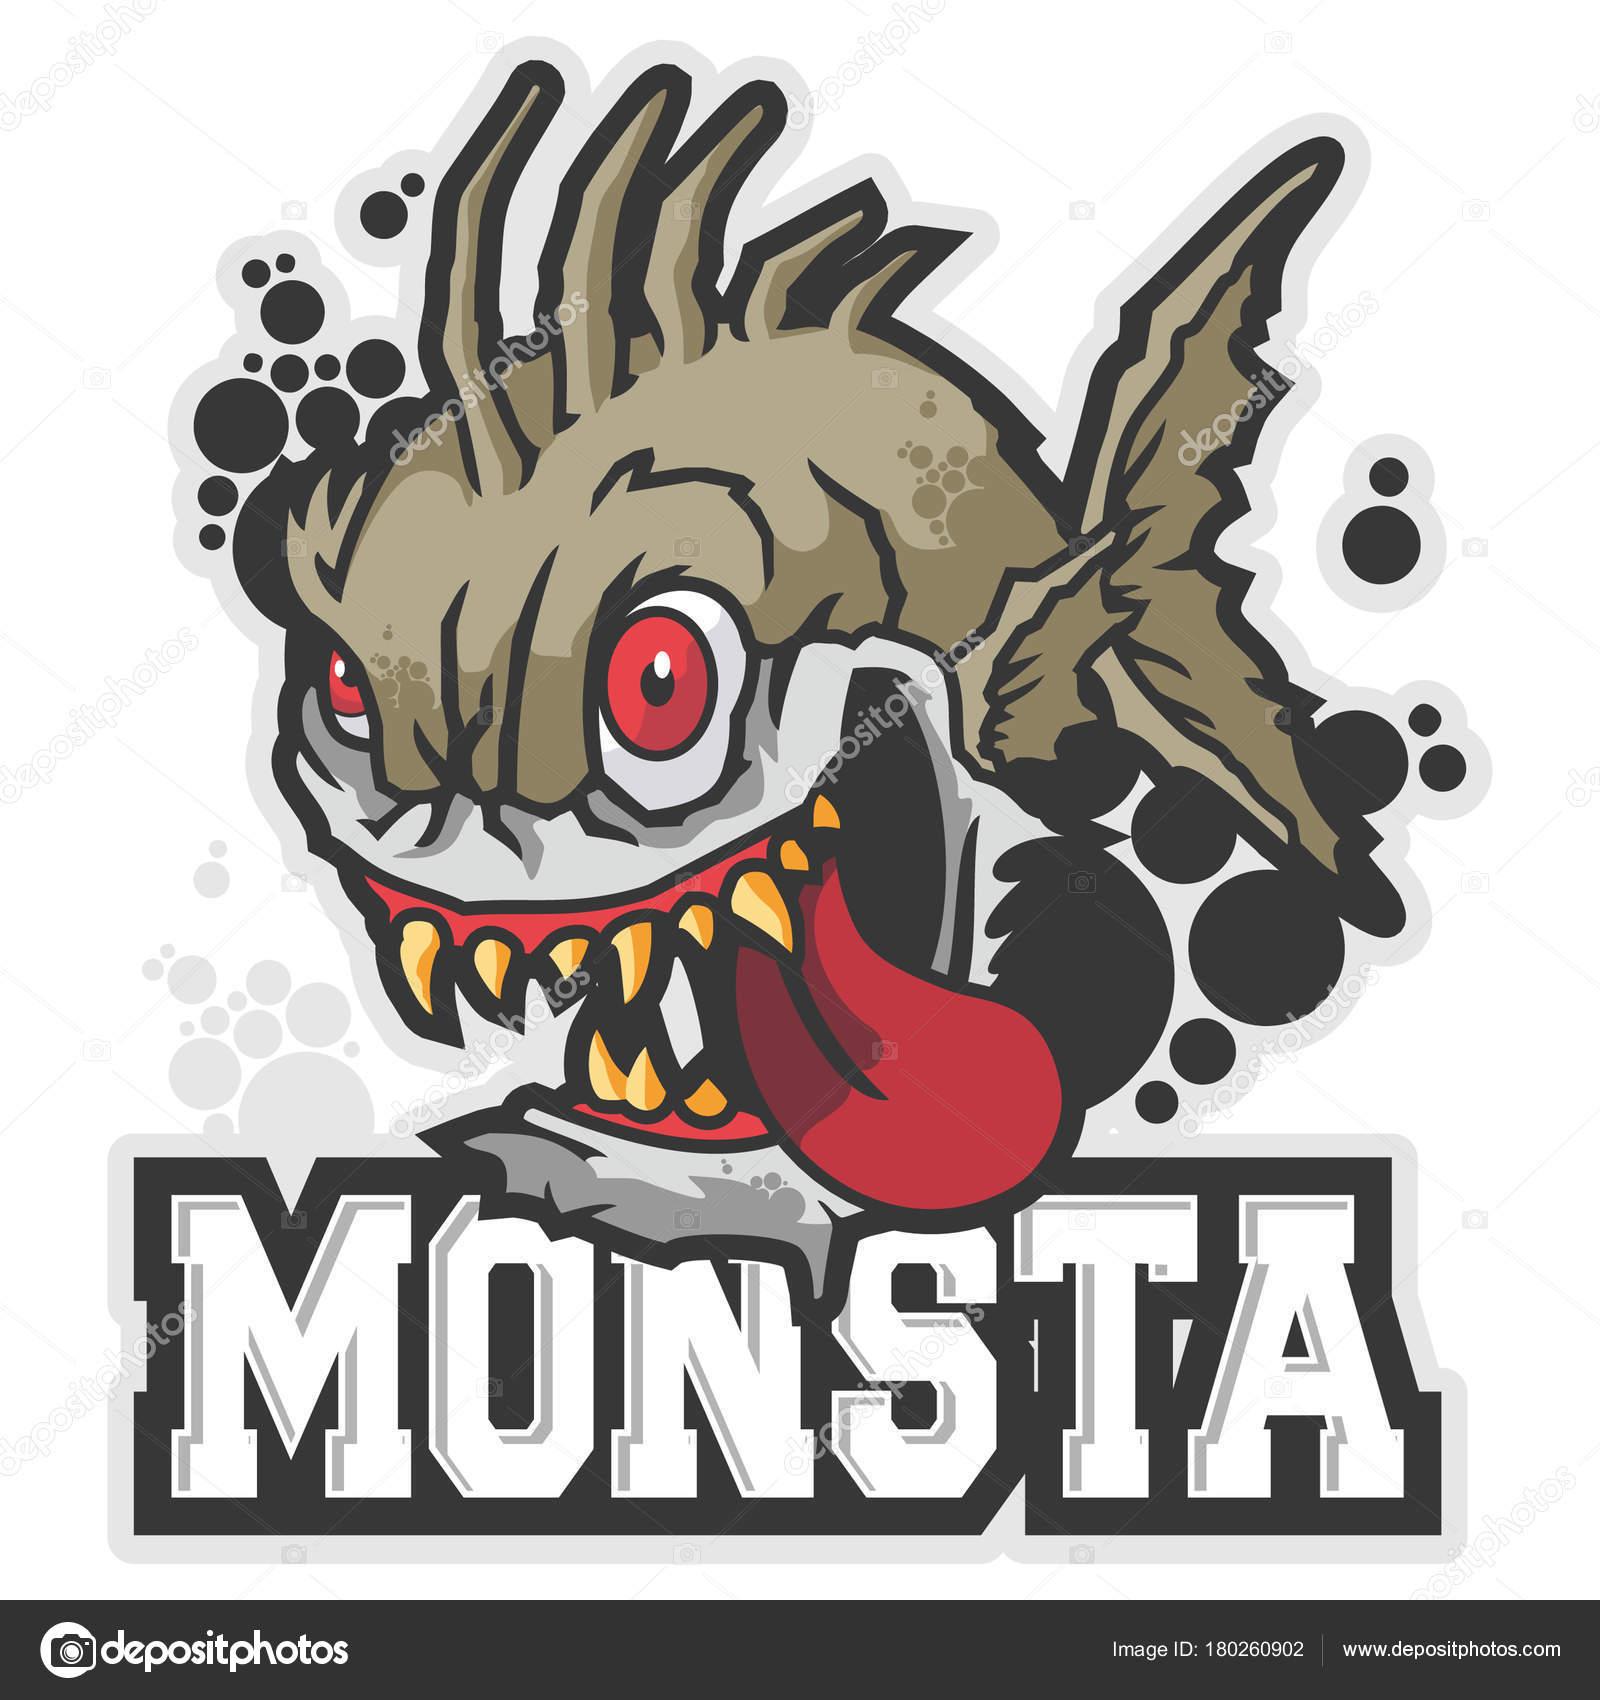 Depredador monstruo pez mascota personaje vector insignia de deporte de dibujos animados vector de